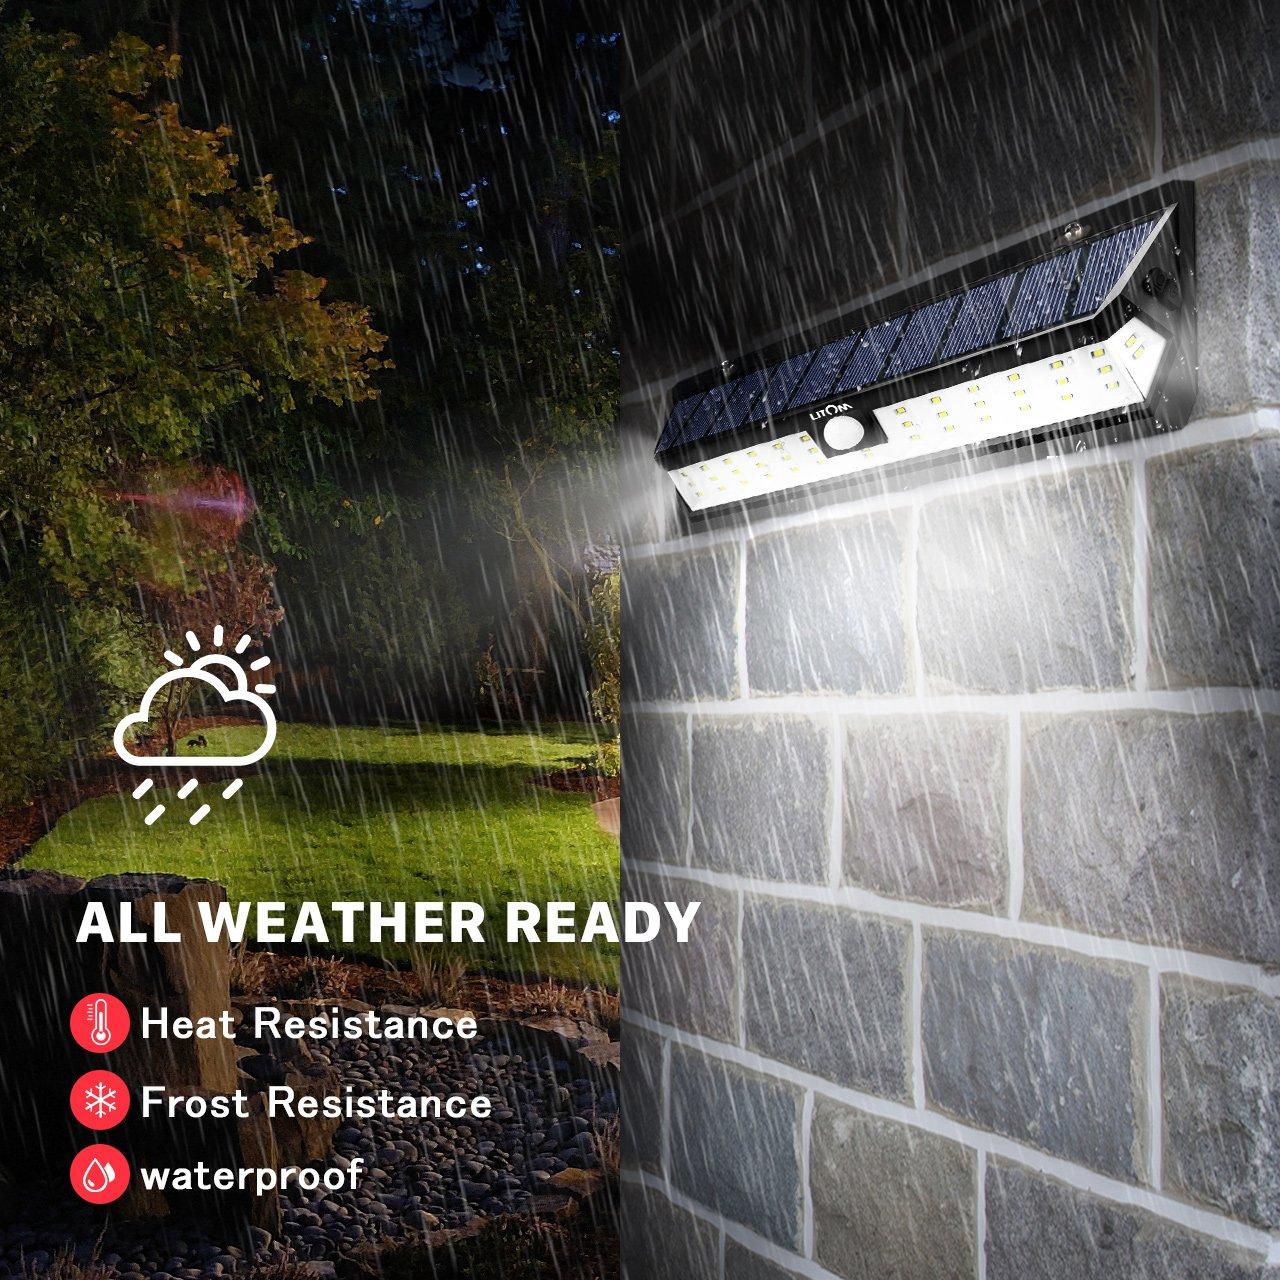 LITOM Solar Lights Outdoor 42 LED, Adjustable Lighting Time Solar Motion Sensor Light with 270° Wide Angle and Waterproof Design, Wireless Solar Lighting for Front Door, Yard, Garage, Deck (2 Pack) by Litom (Image #2)